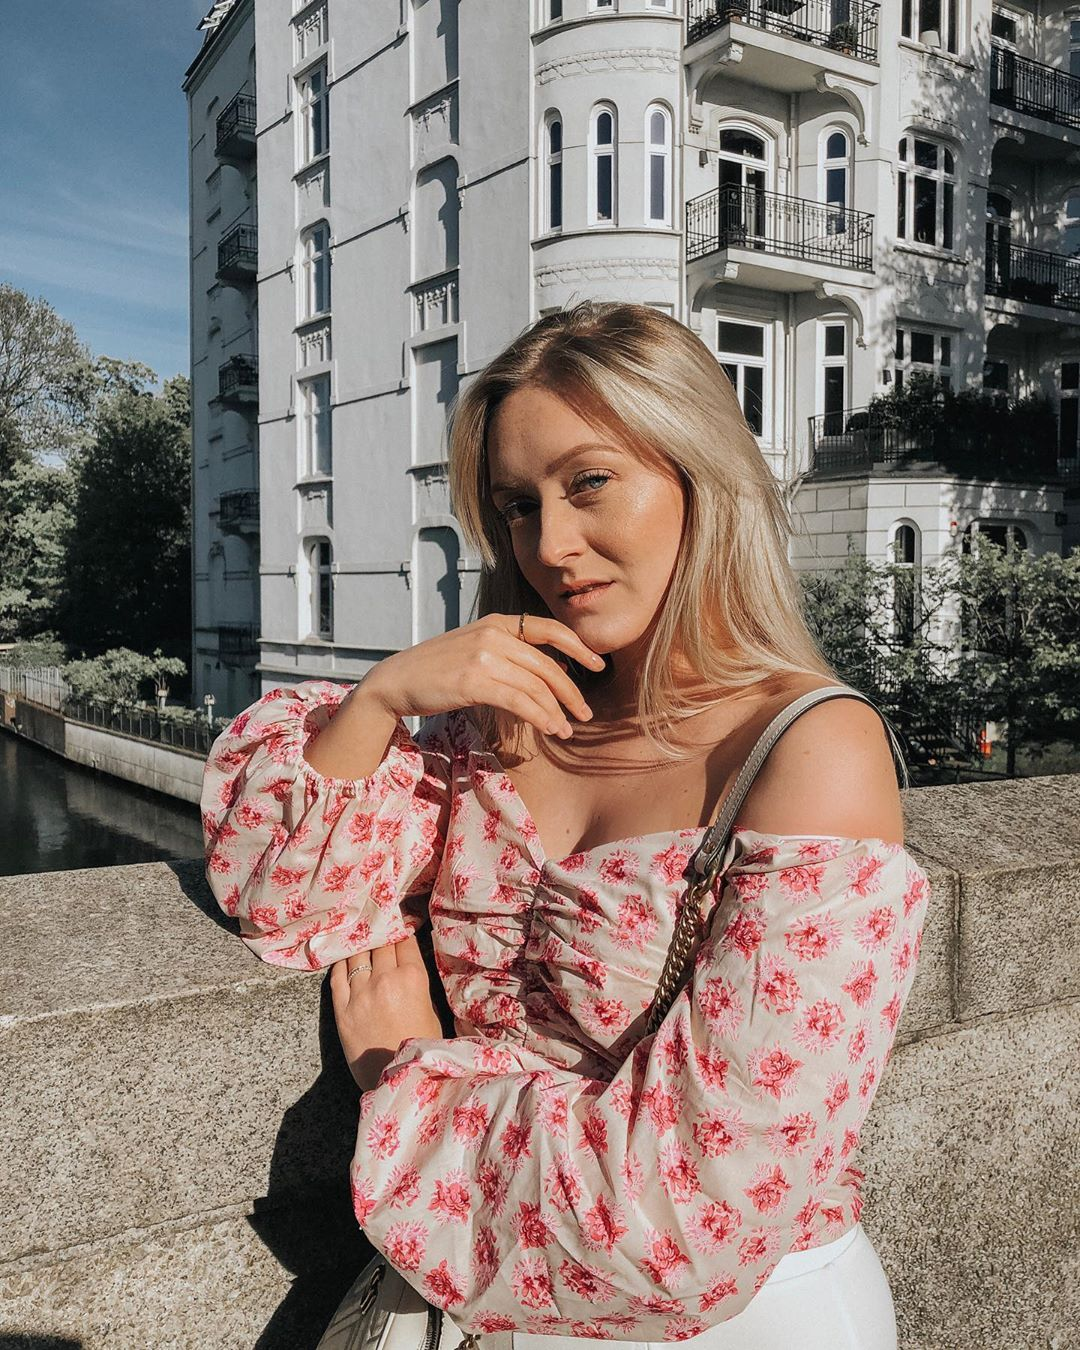 printed drape top de Zara sur finjasophiie sur SCANDALOOK